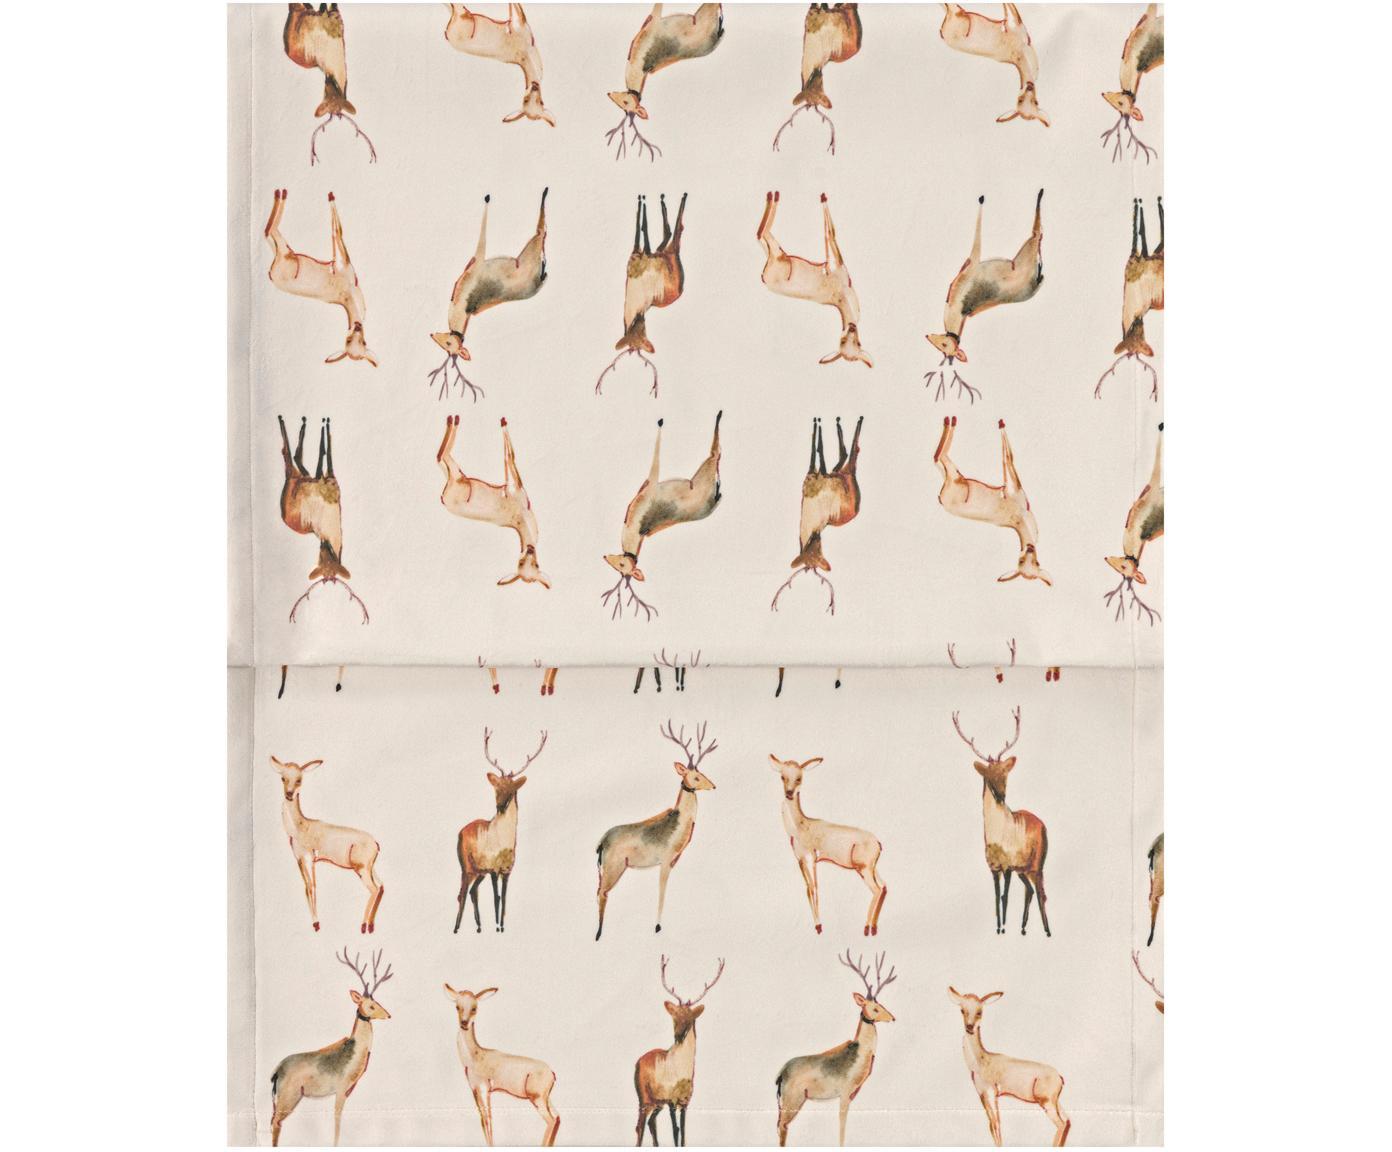 Runner da tavolo in velluto con cervi Herde, Velluto di poliestere, Beige, tonalità blu, Larg. 40 x Lung. 145 cm